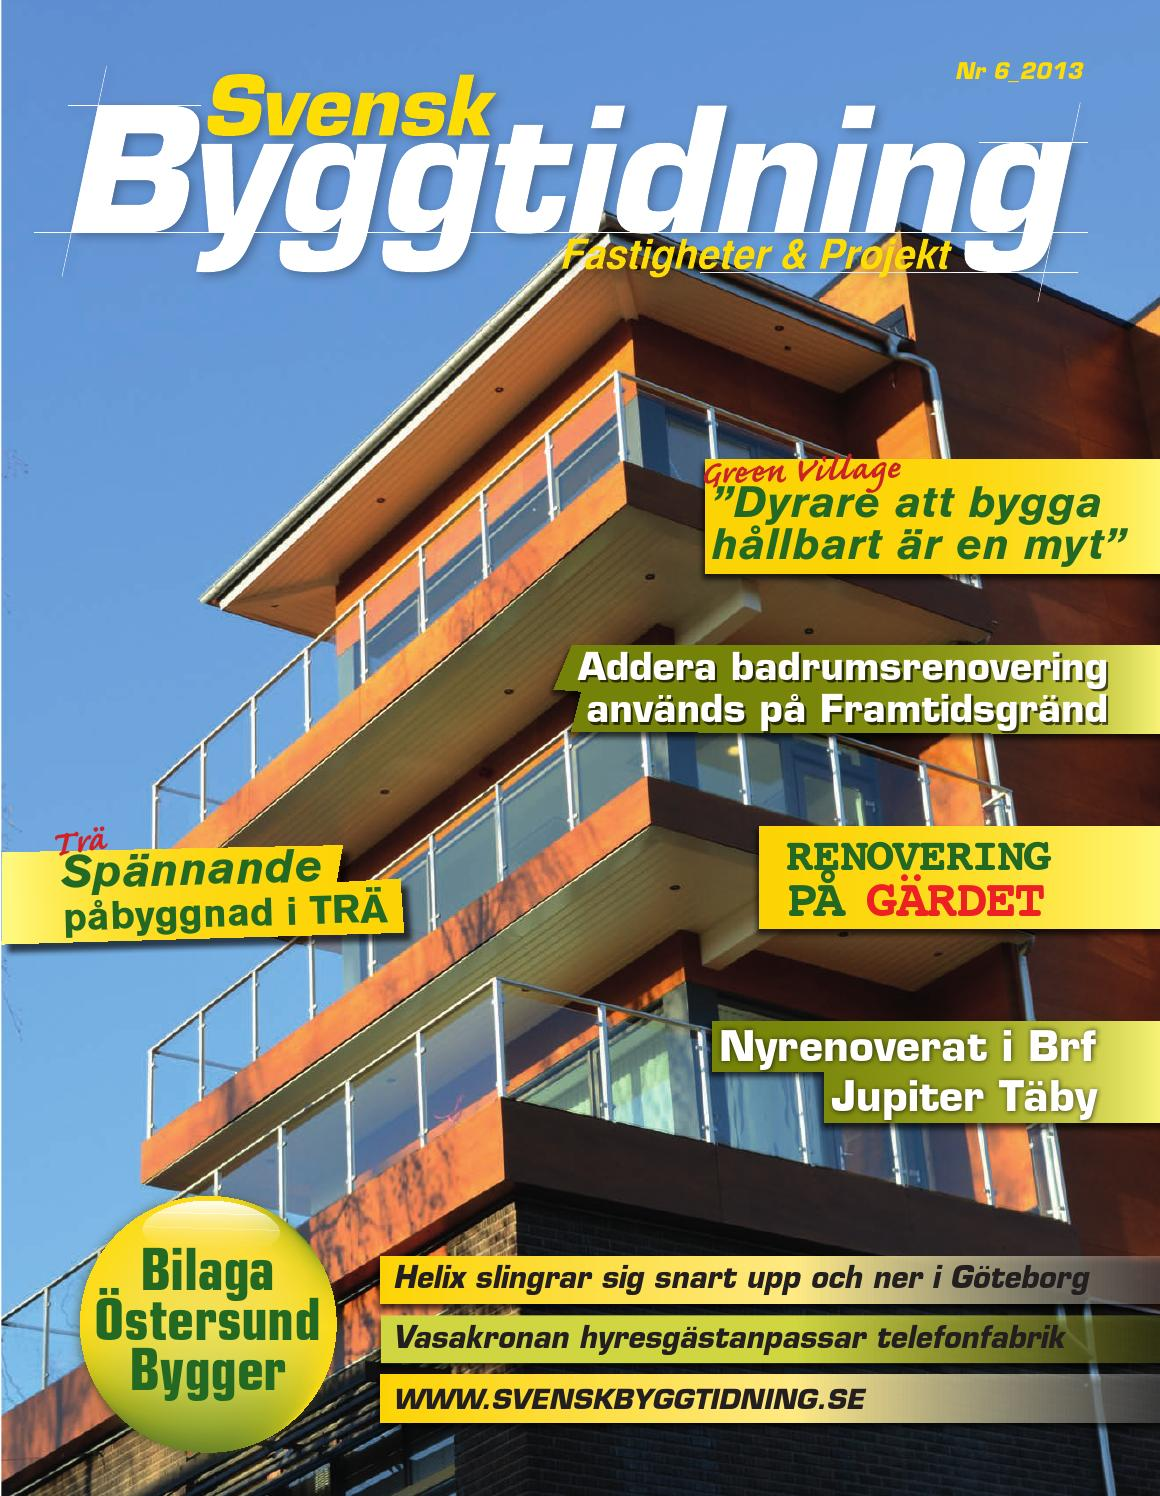 Svensk Byggtidning 6 13 by Stordåhd Kommunikation AB - issuu 8d72a96e68401